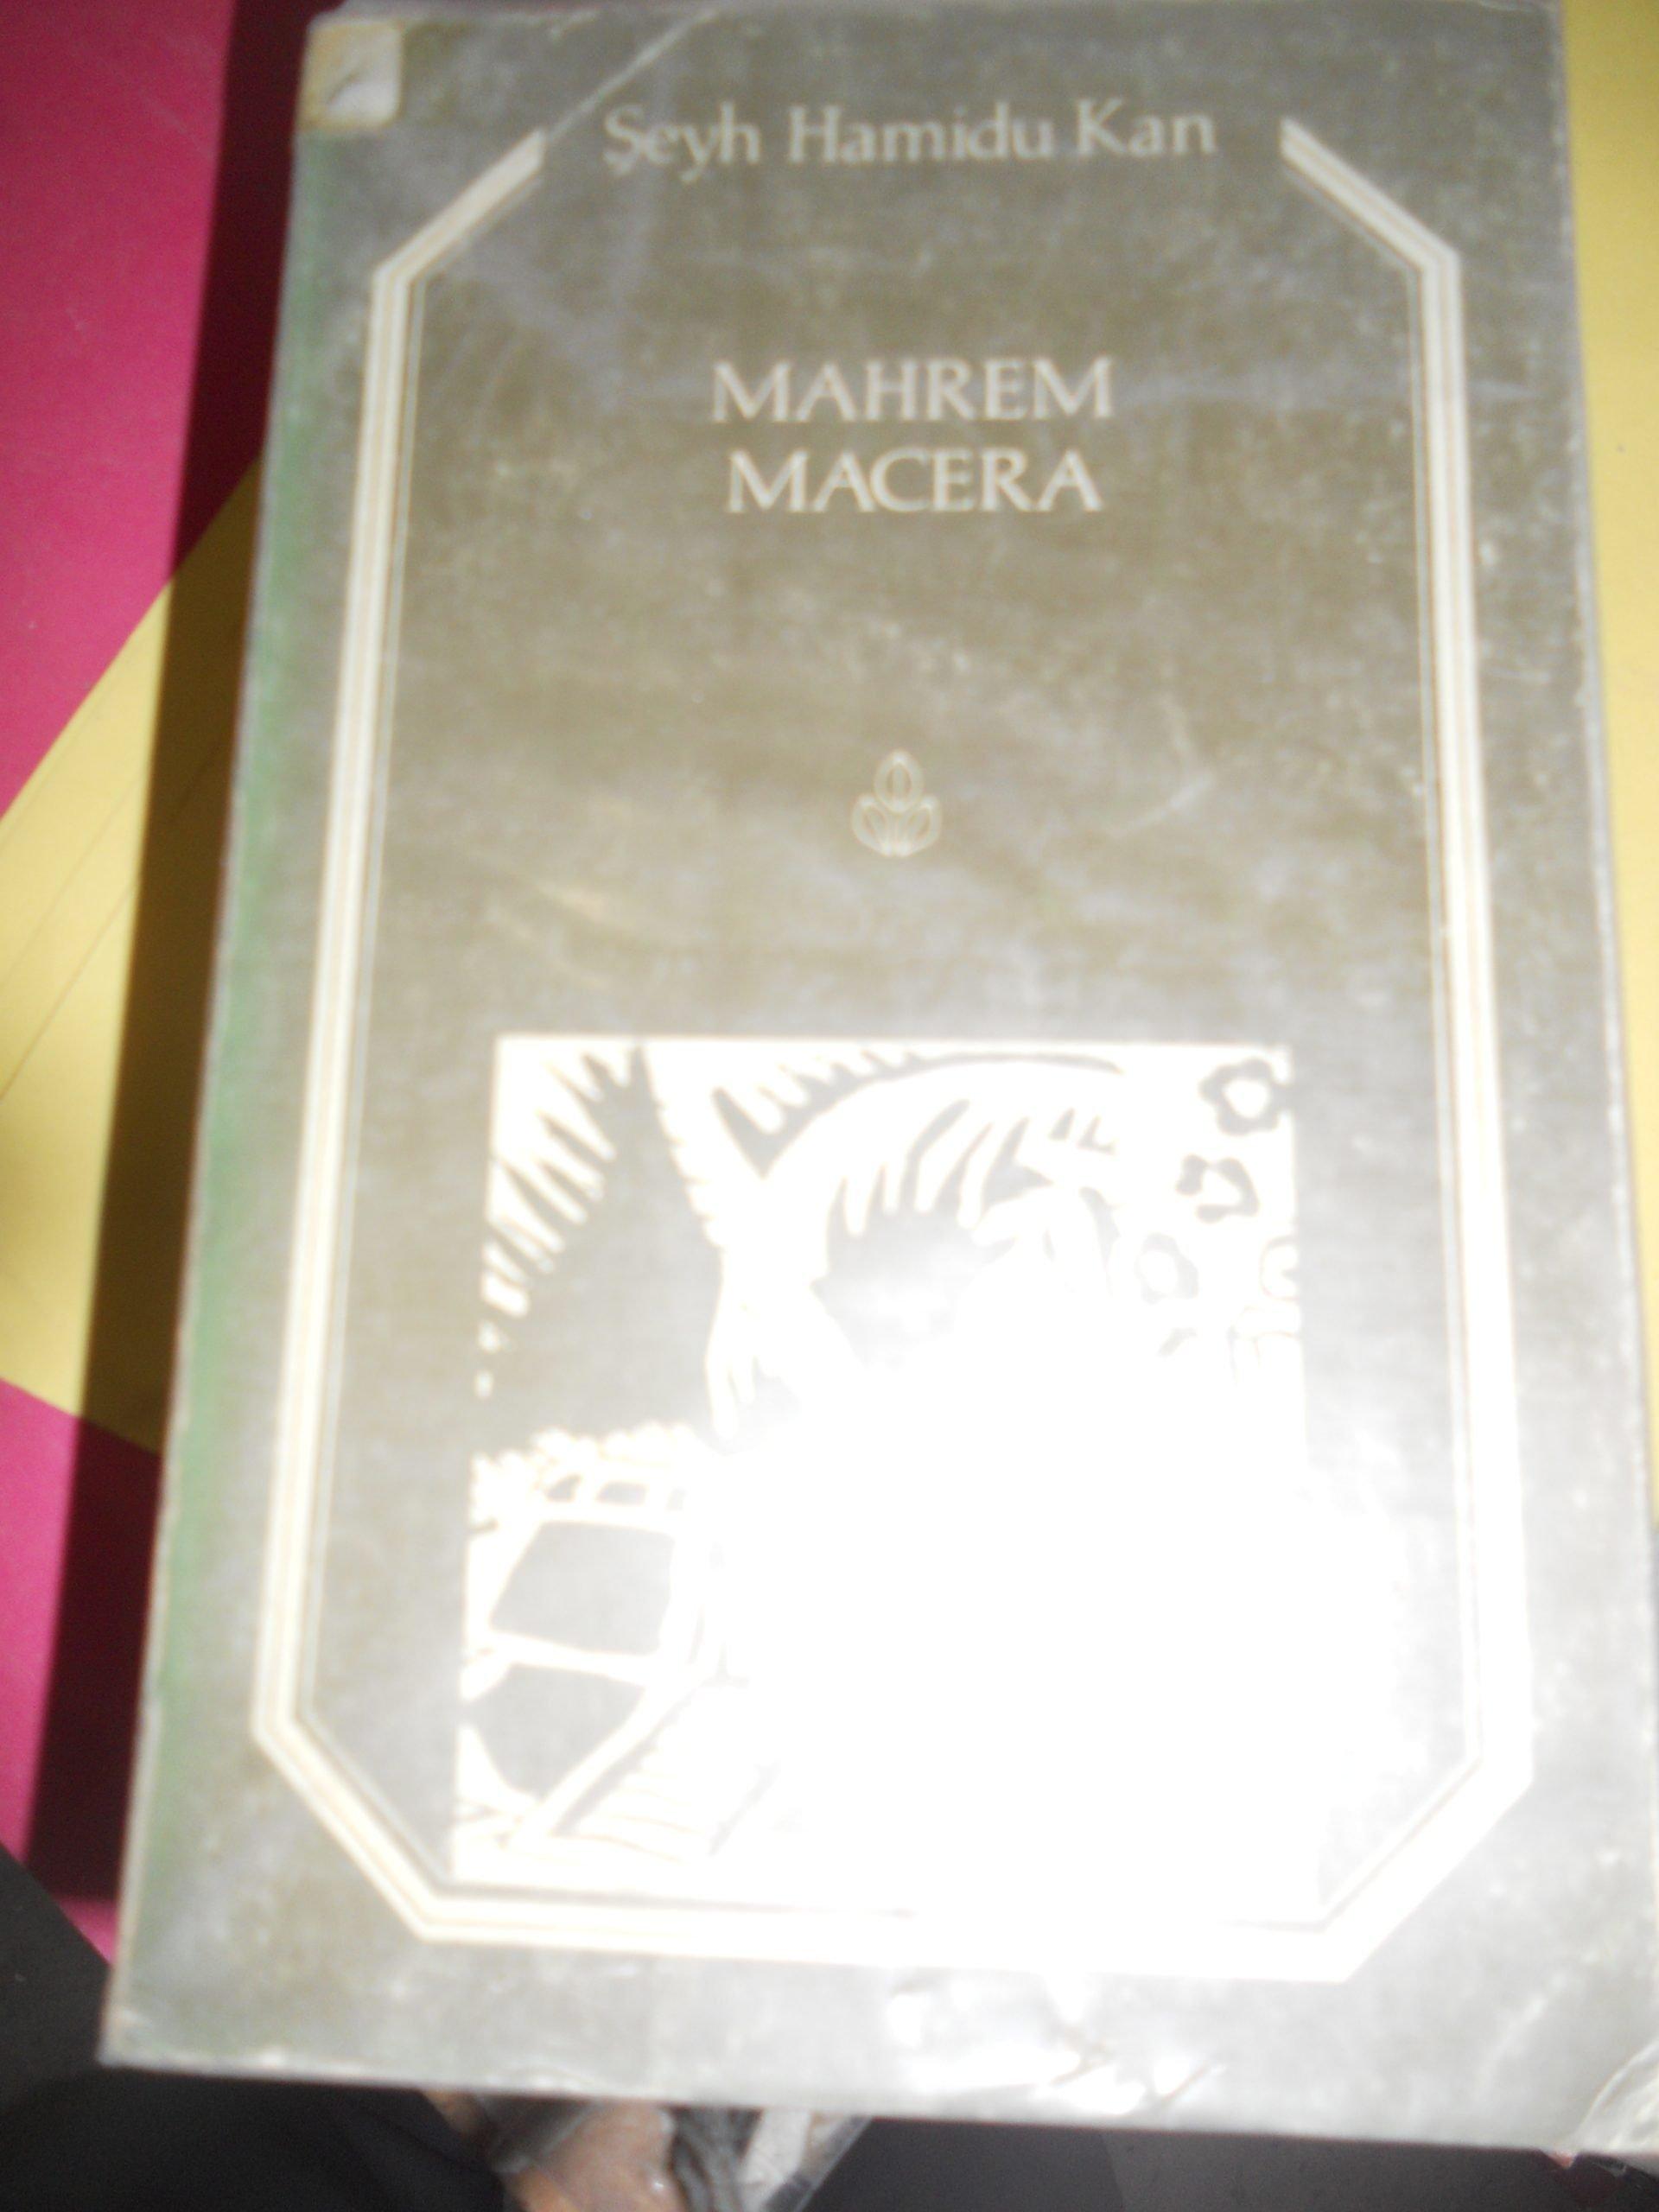 MAHREM MACERA /Şeyh Hamidu Kan/10 TL(SATILDI)